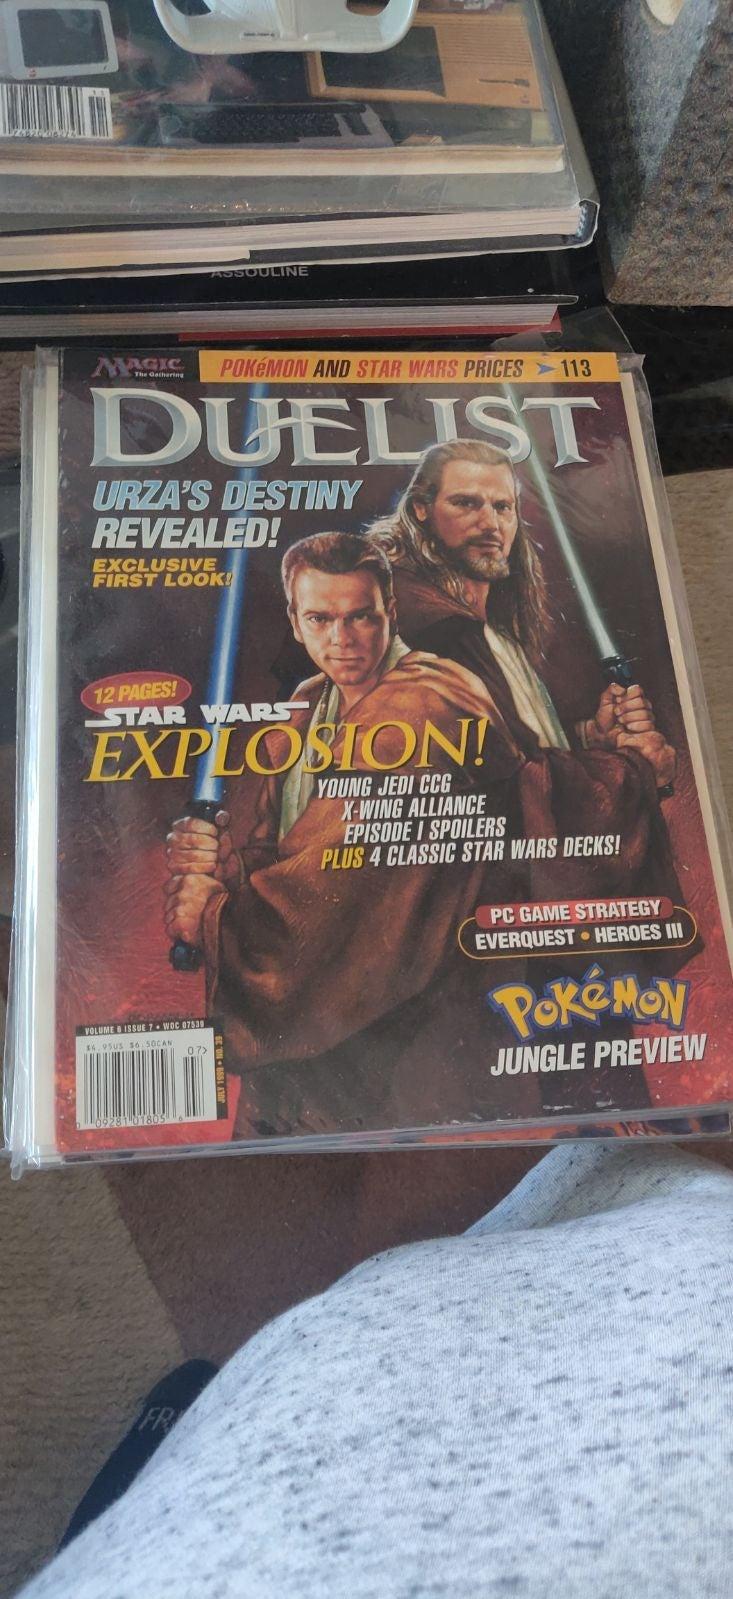 Duelist volume 6 issue 7. Mtg. magic.